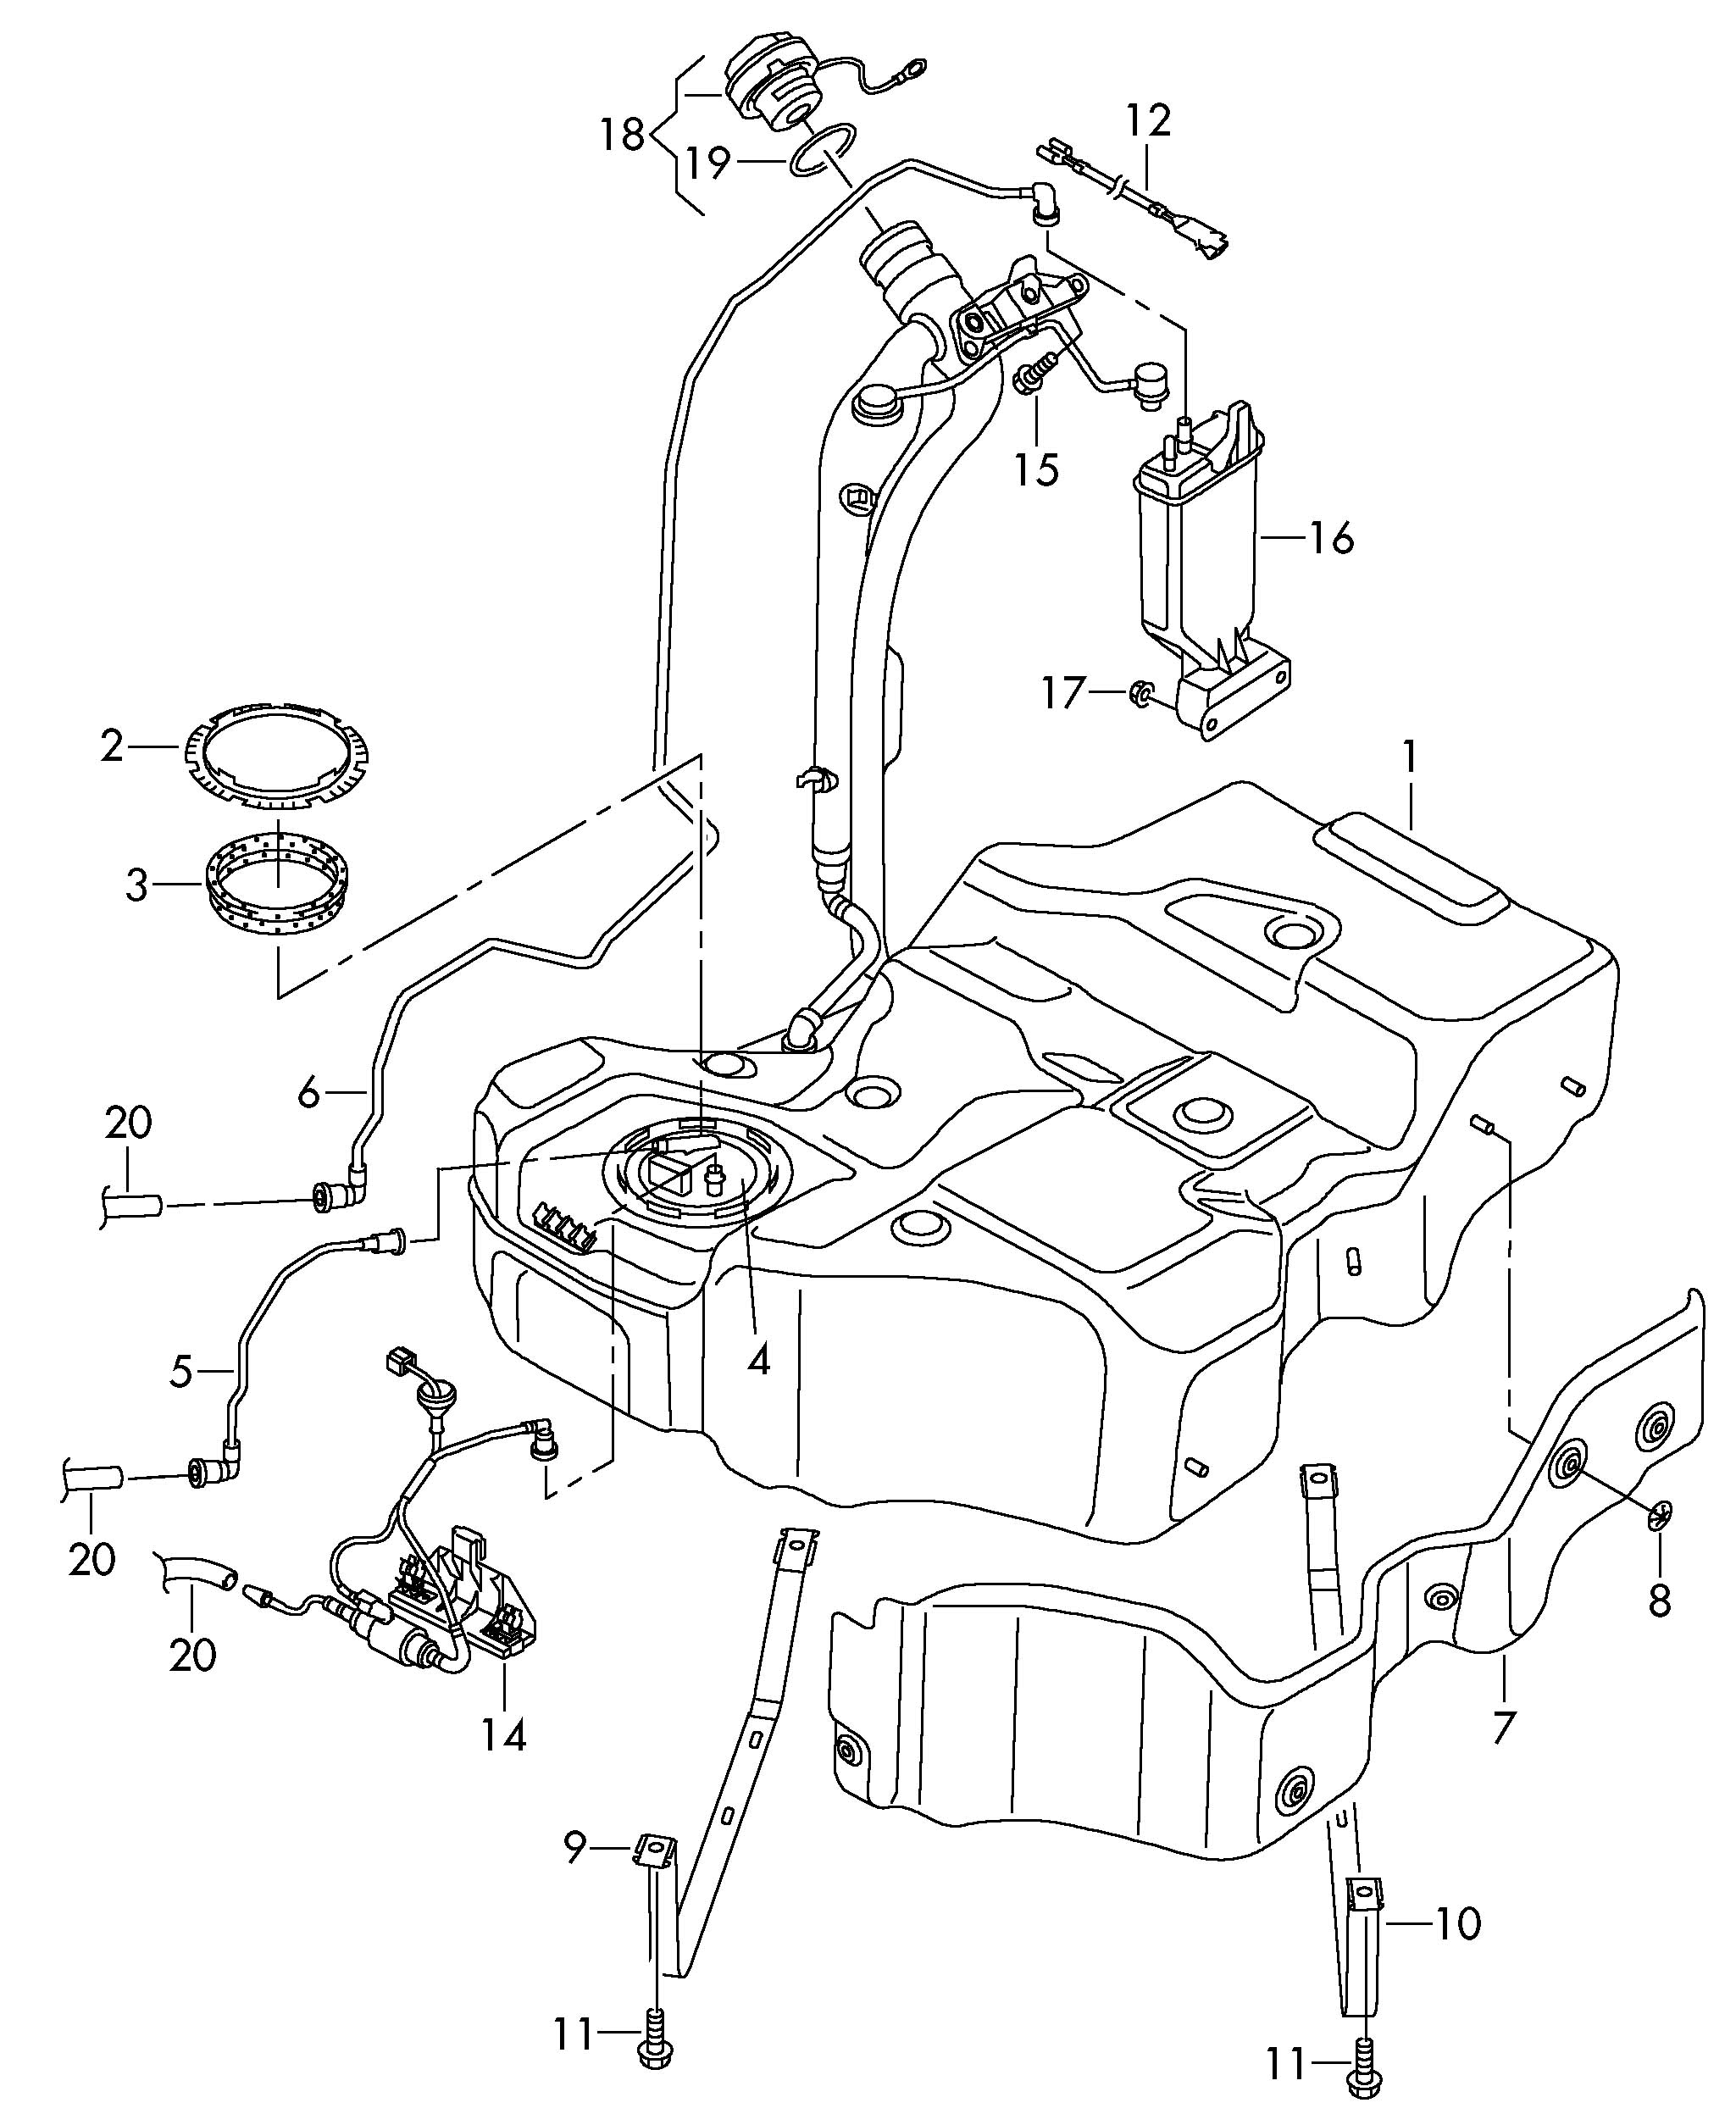 Volkswagen Passat CC Fuel tank with attached parts